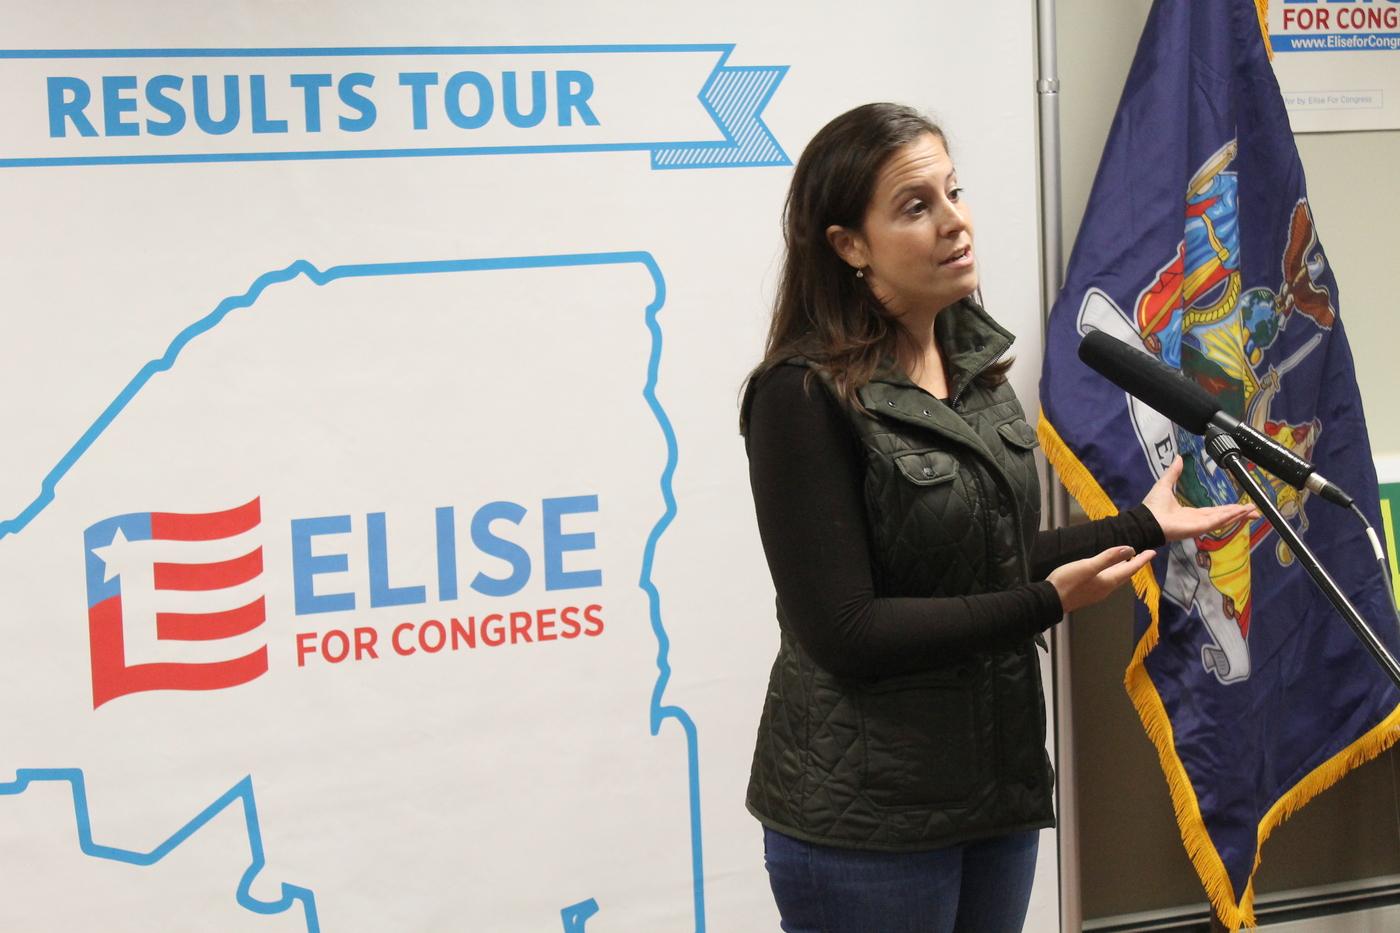 Rep. Elise Stefanik. NCPR File Photo: Zach Hirsch